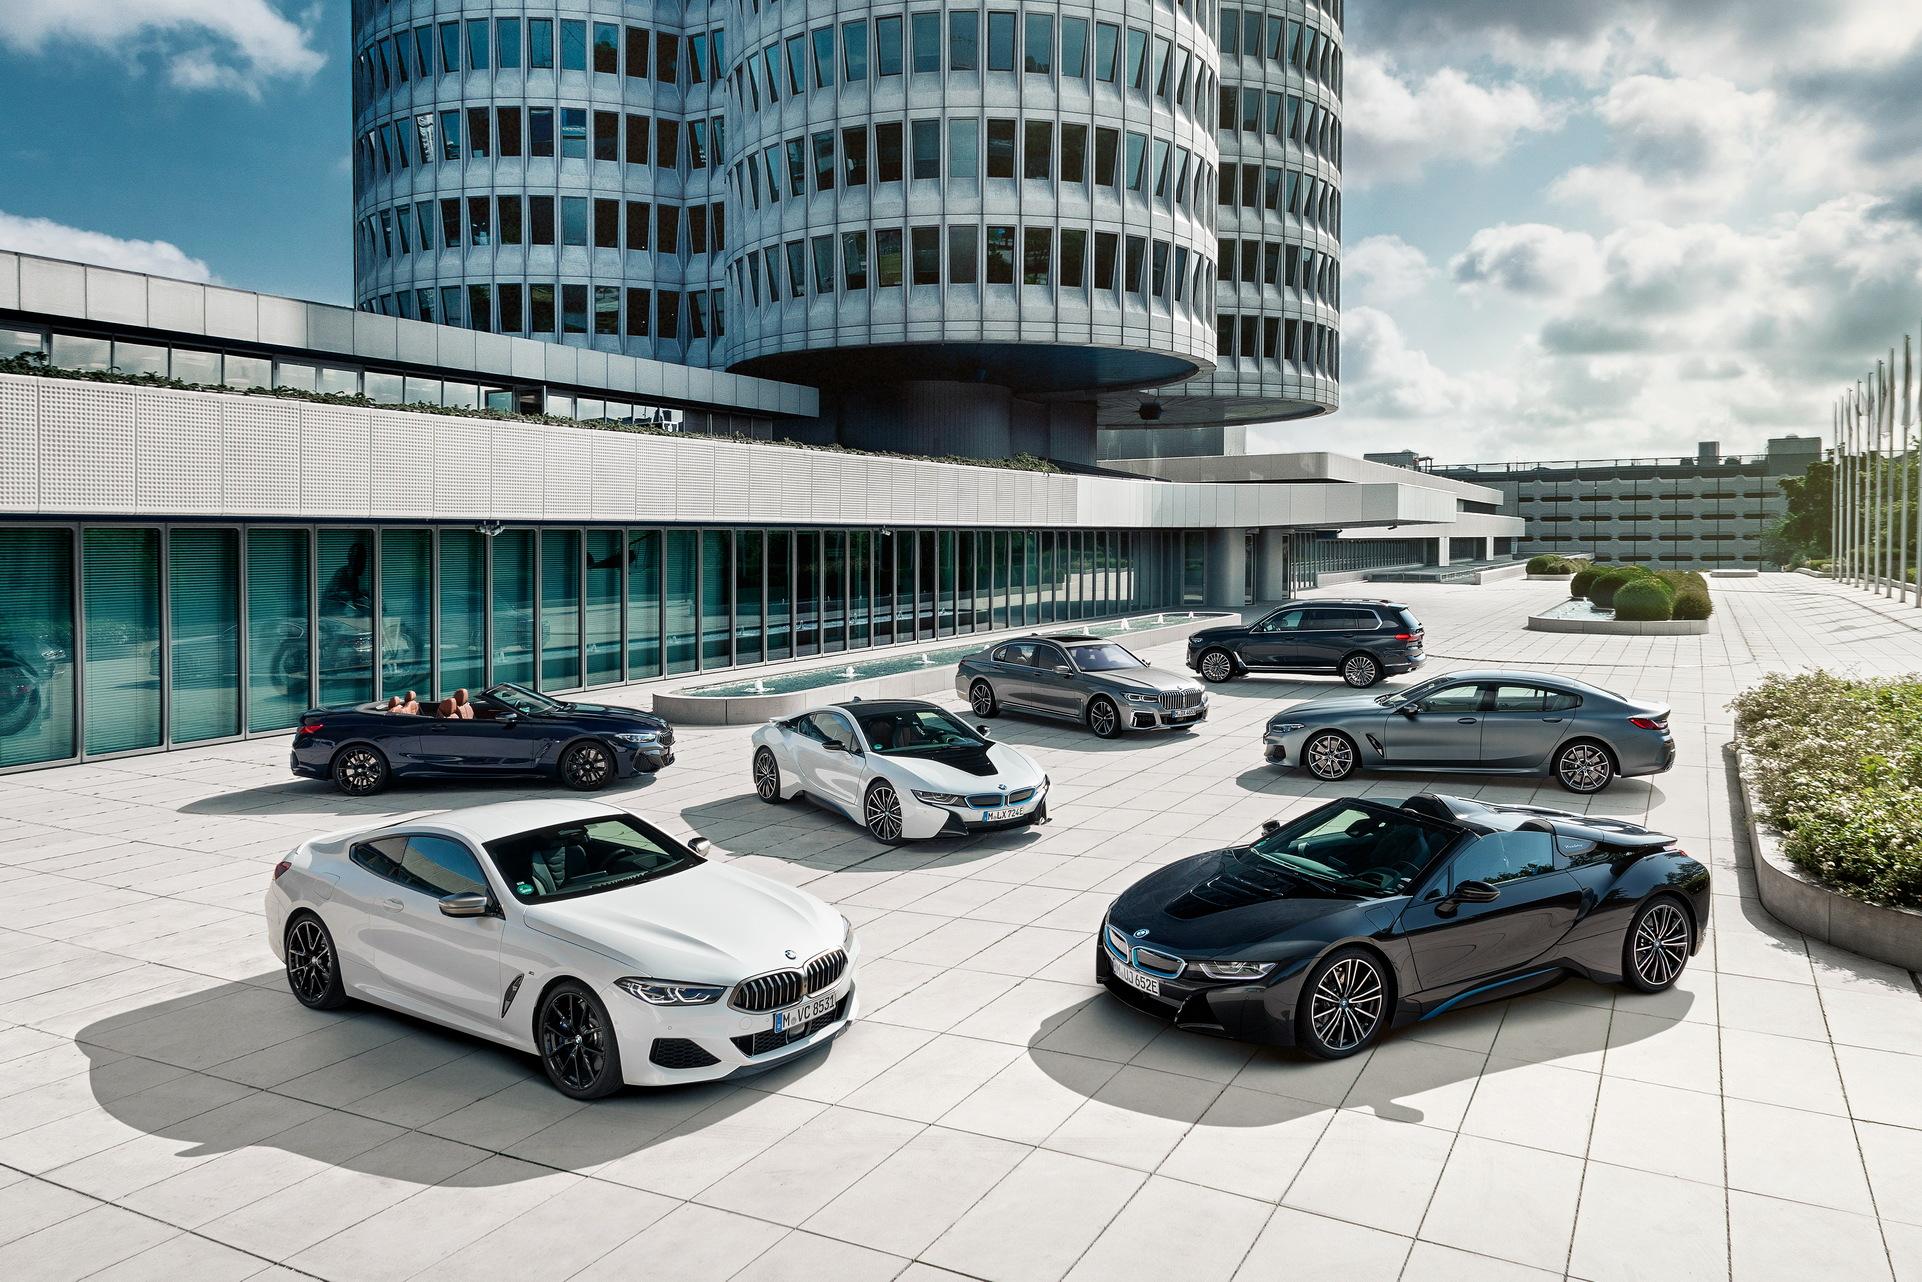 Kekurangan Audi Bmw Mercedes Tangguh